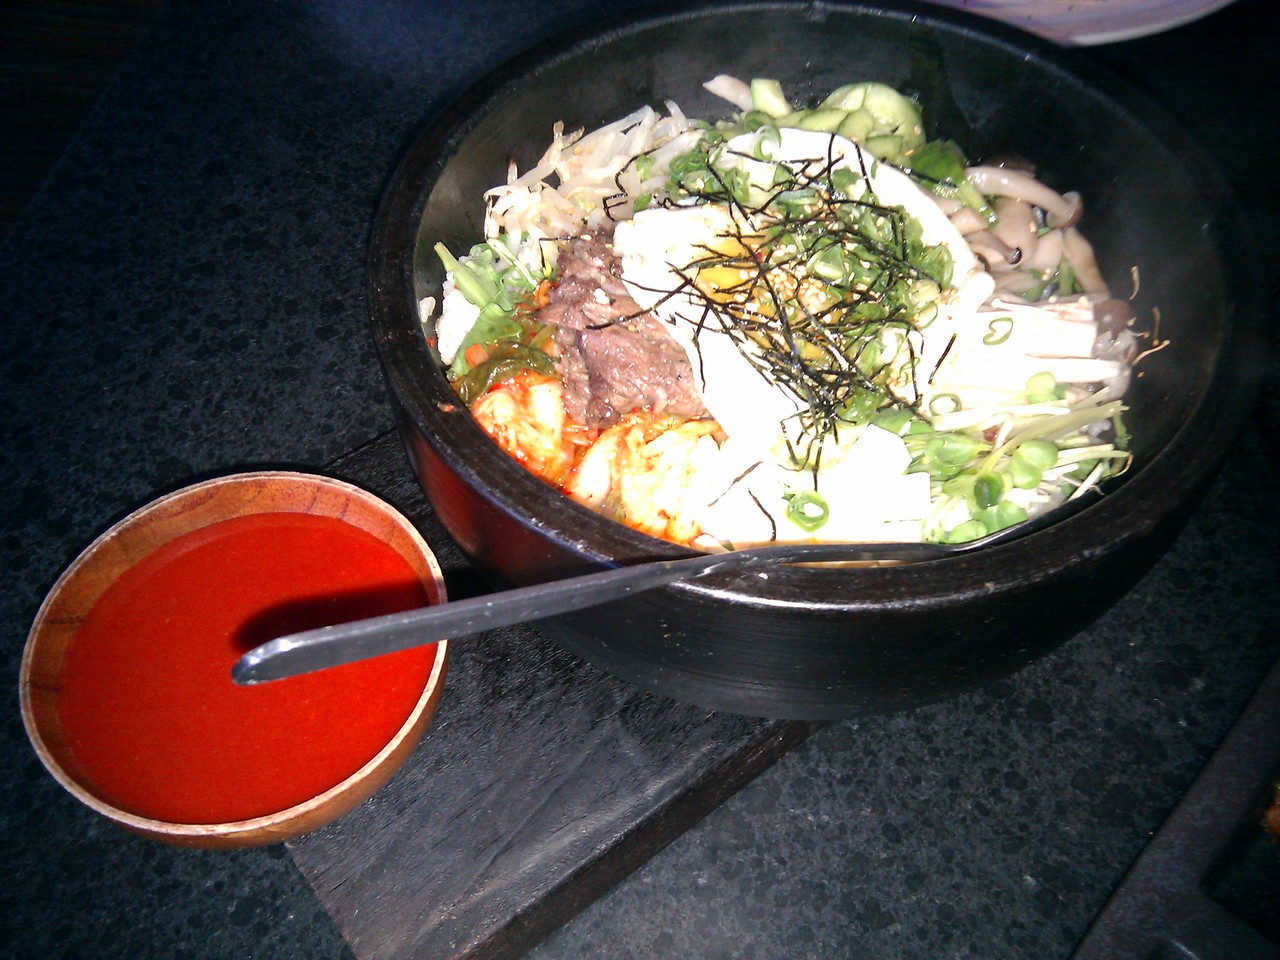 Namu - Sizzling Stonepot with Kobe Steak